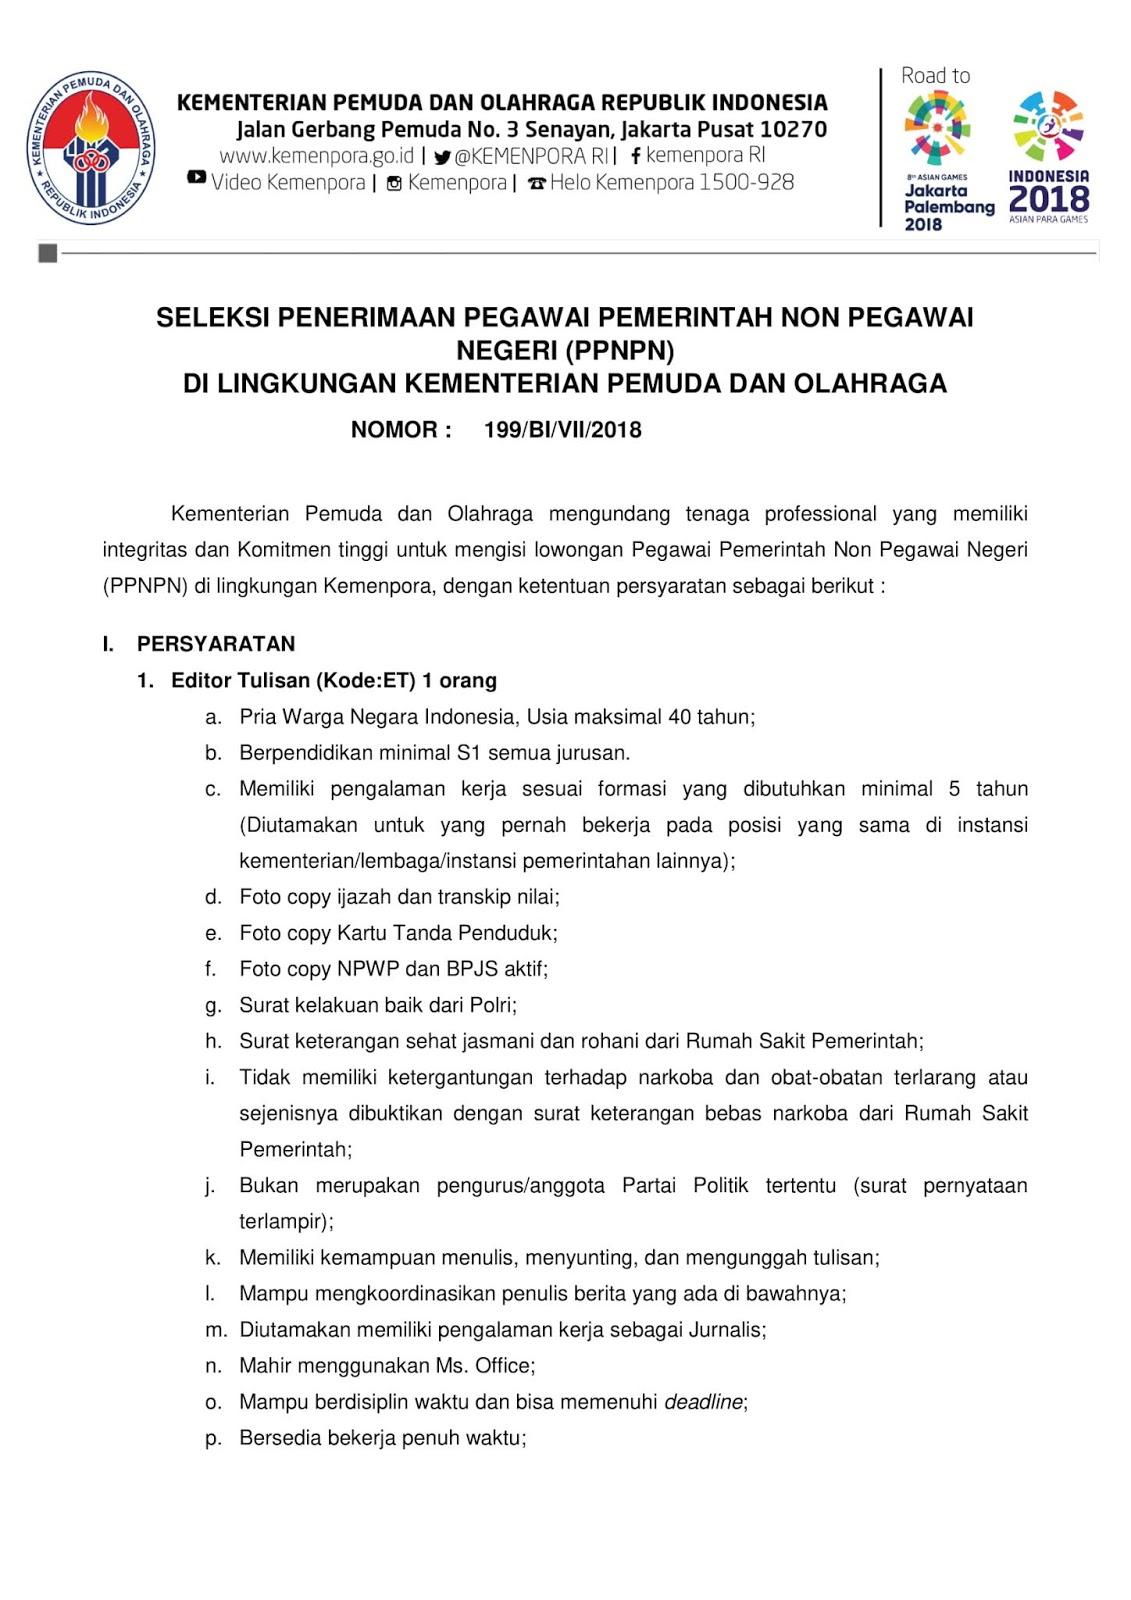 Rekrutmen PPNPN Kementerian Pemuda dan Olahraga